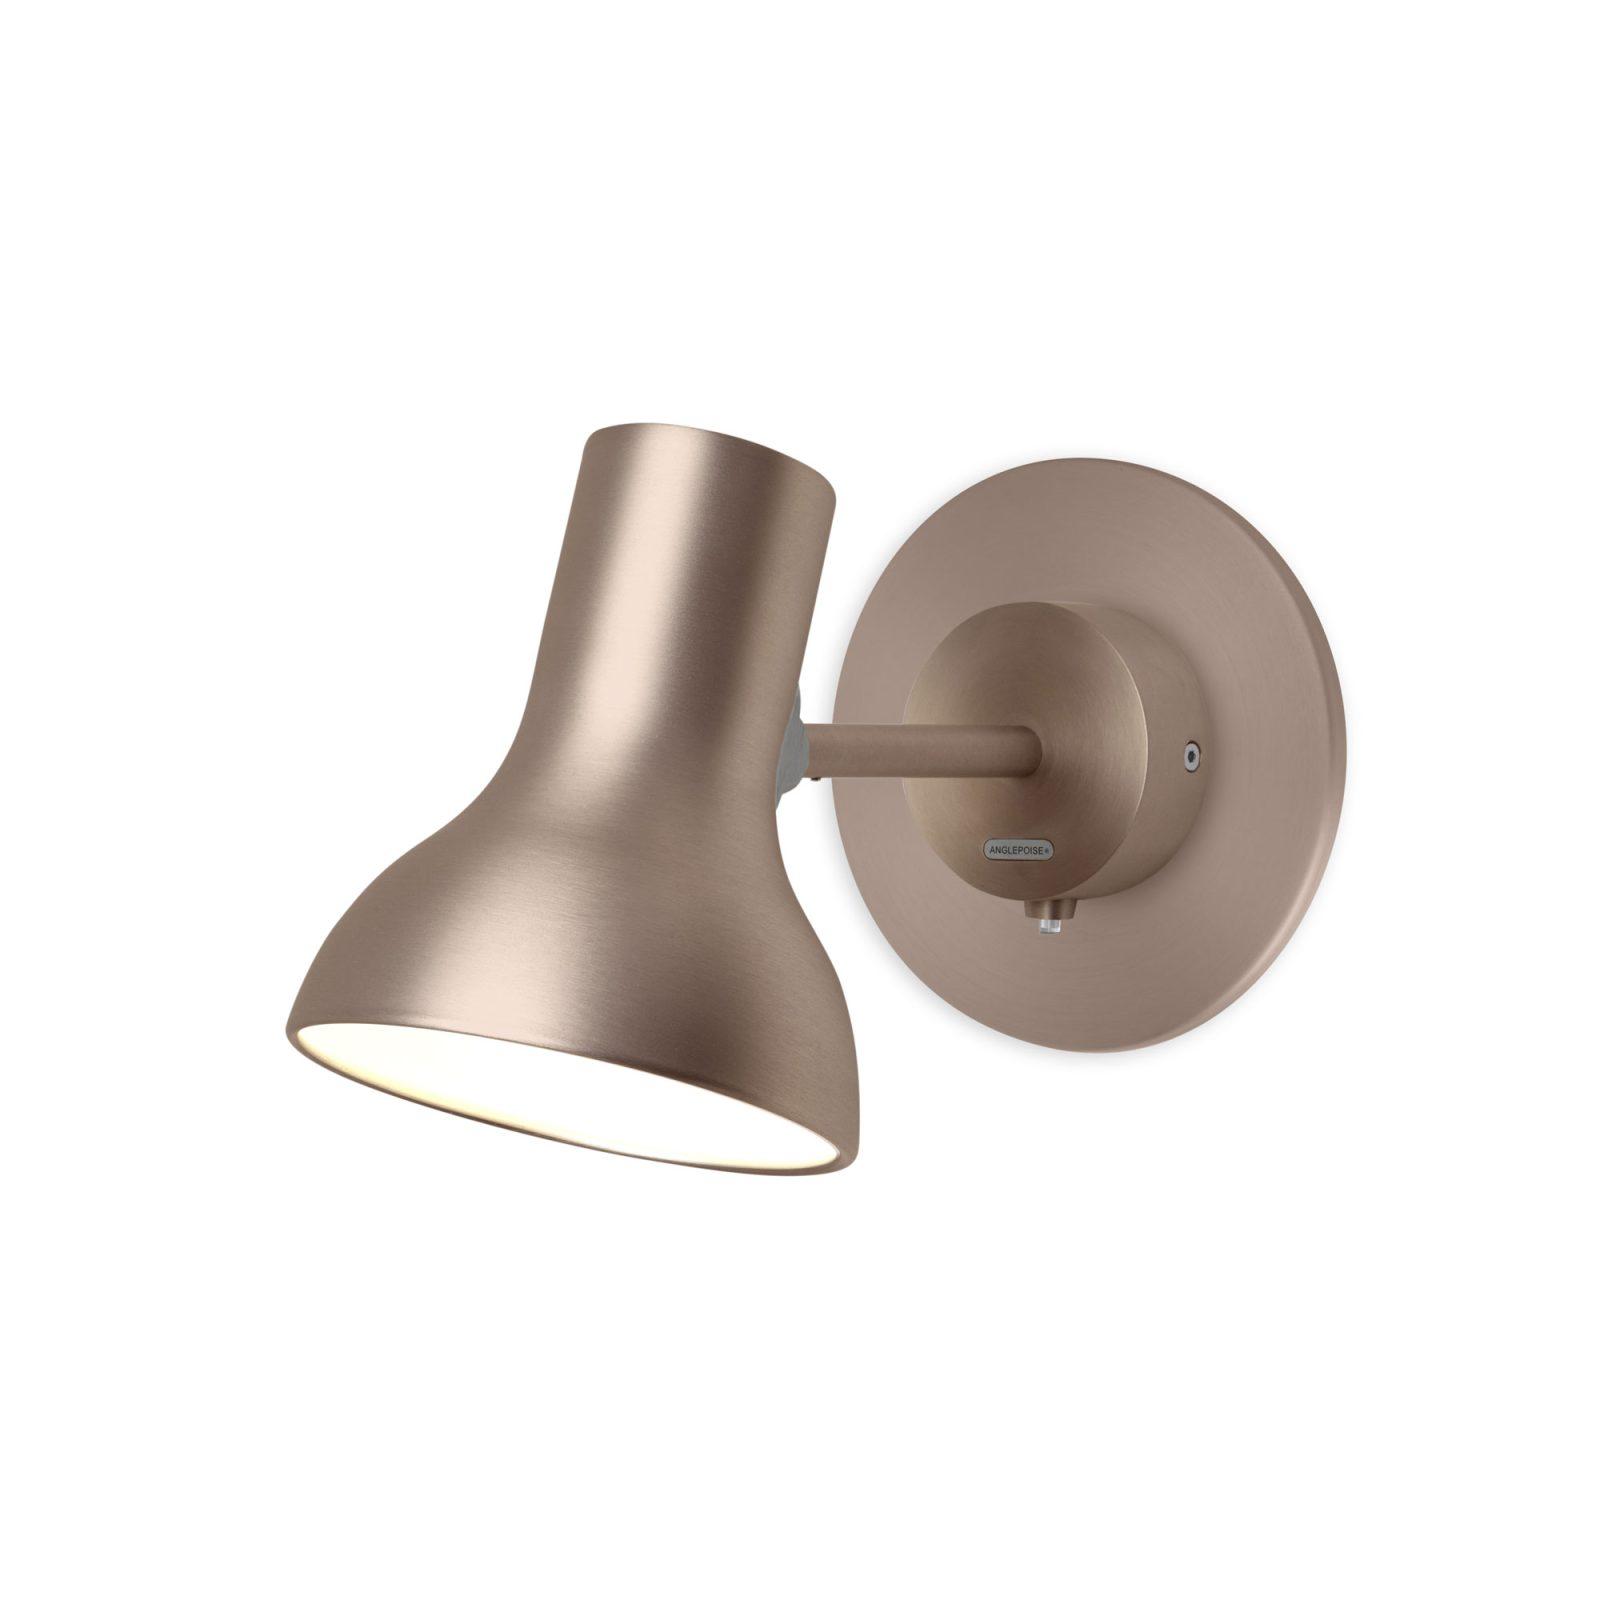 type-75-mini-metallic-wall-light-4